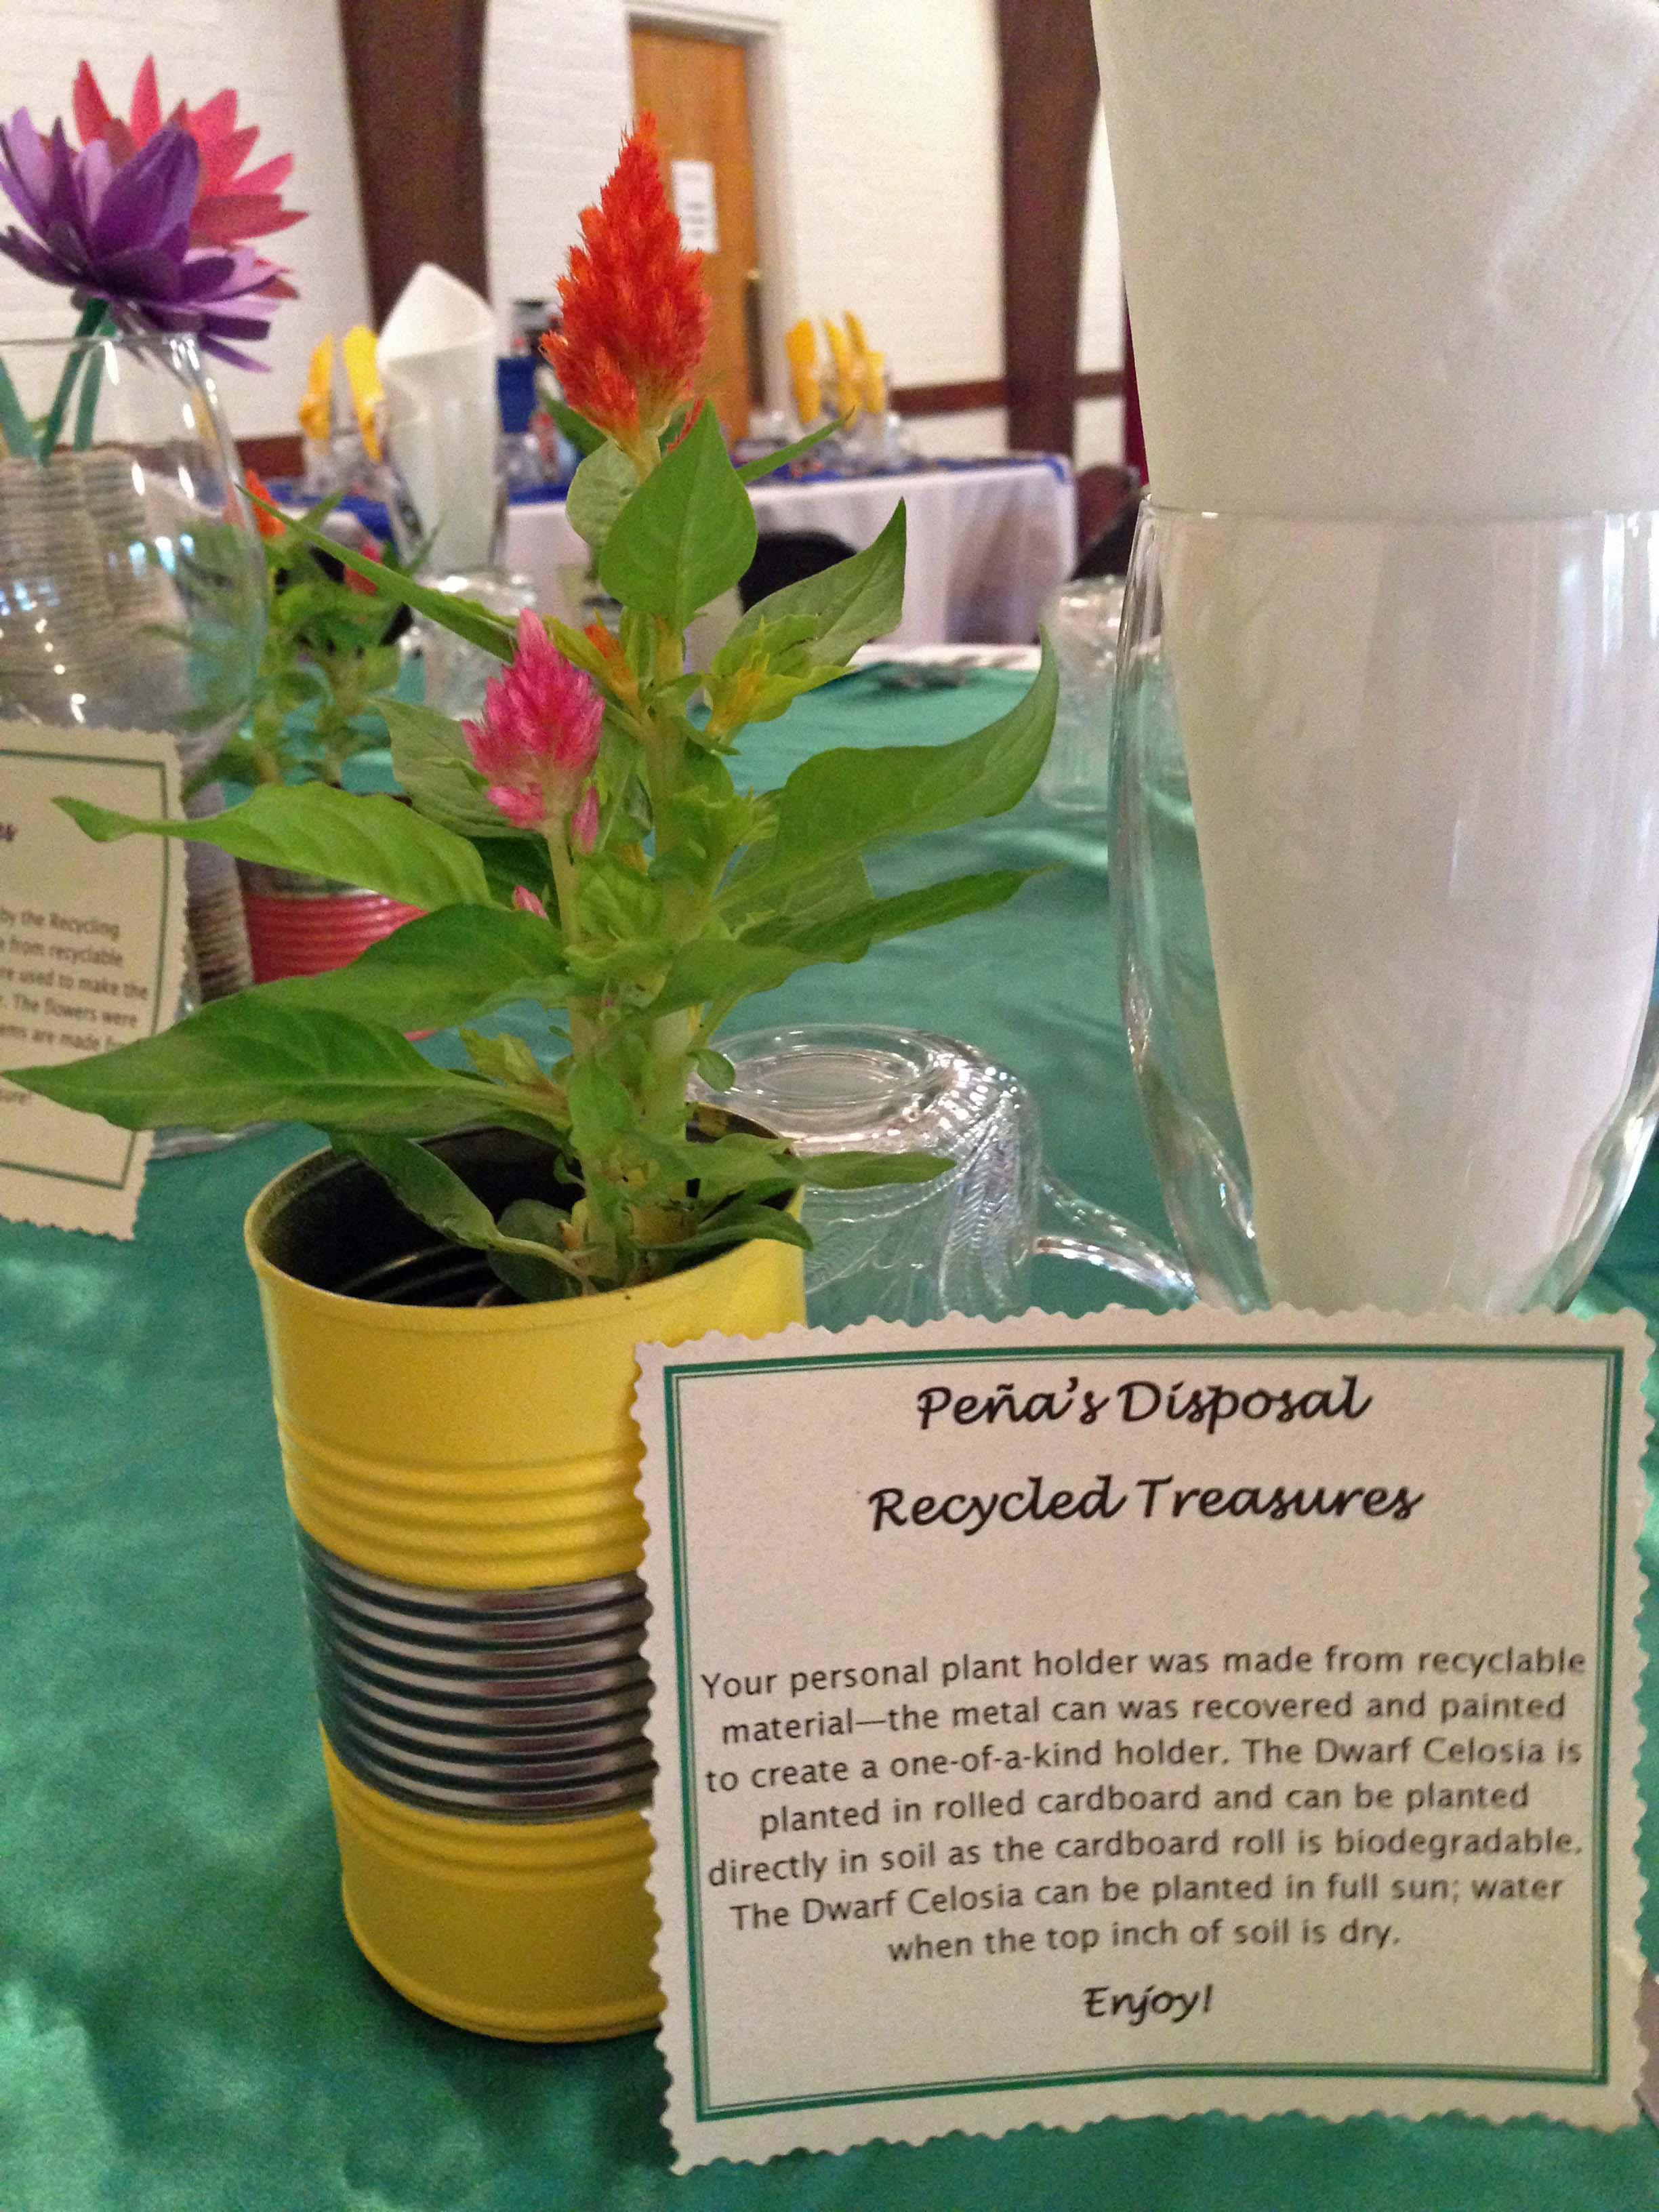 Peña's Disposal Recycling Treasures 2015